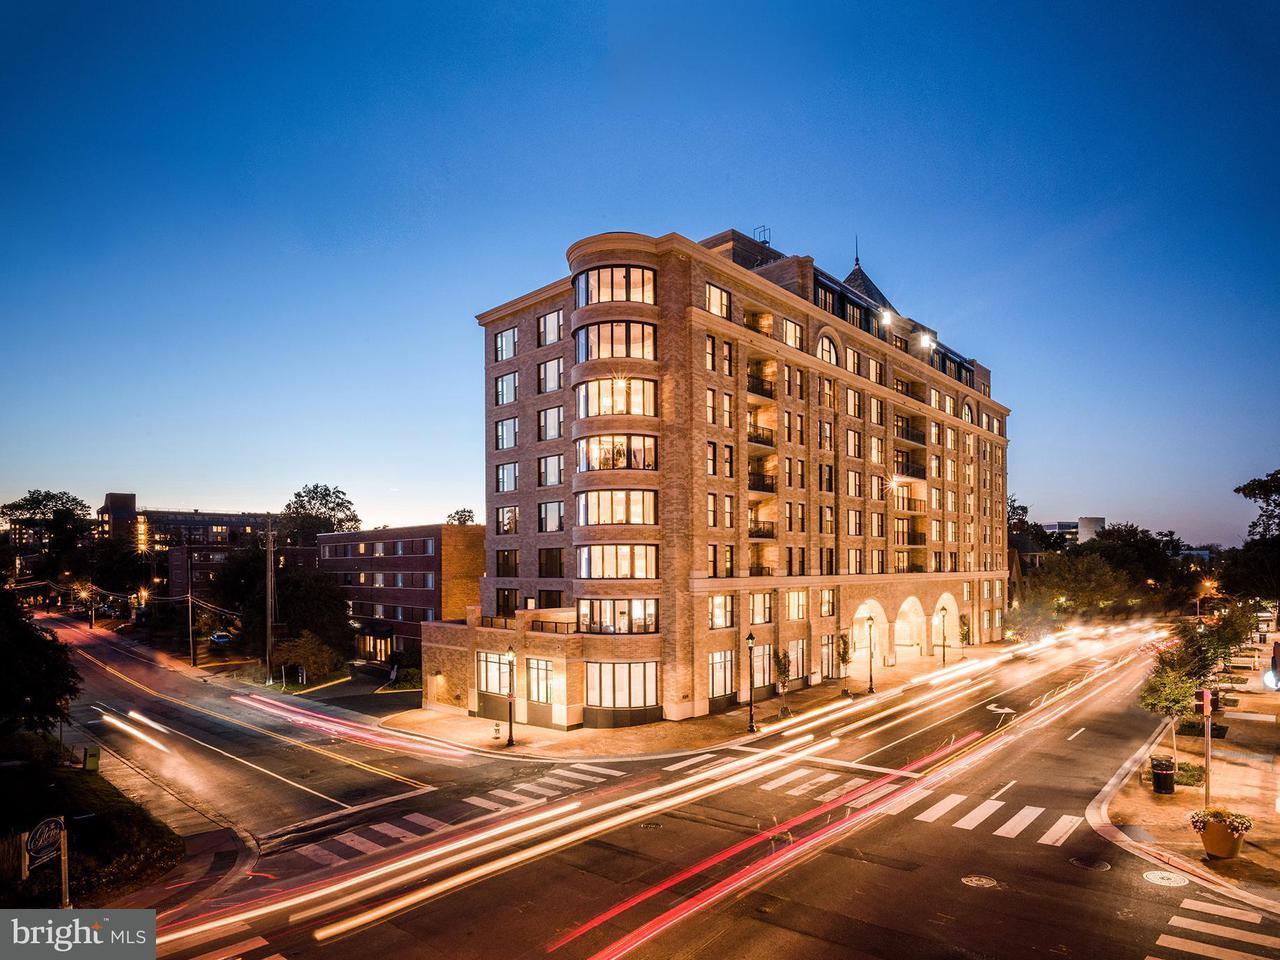 Condominium for Sale at 8302 Woodmont Ave #403 8302 Woodmont Ave #403 Bethesda, Maryland 20814 United States